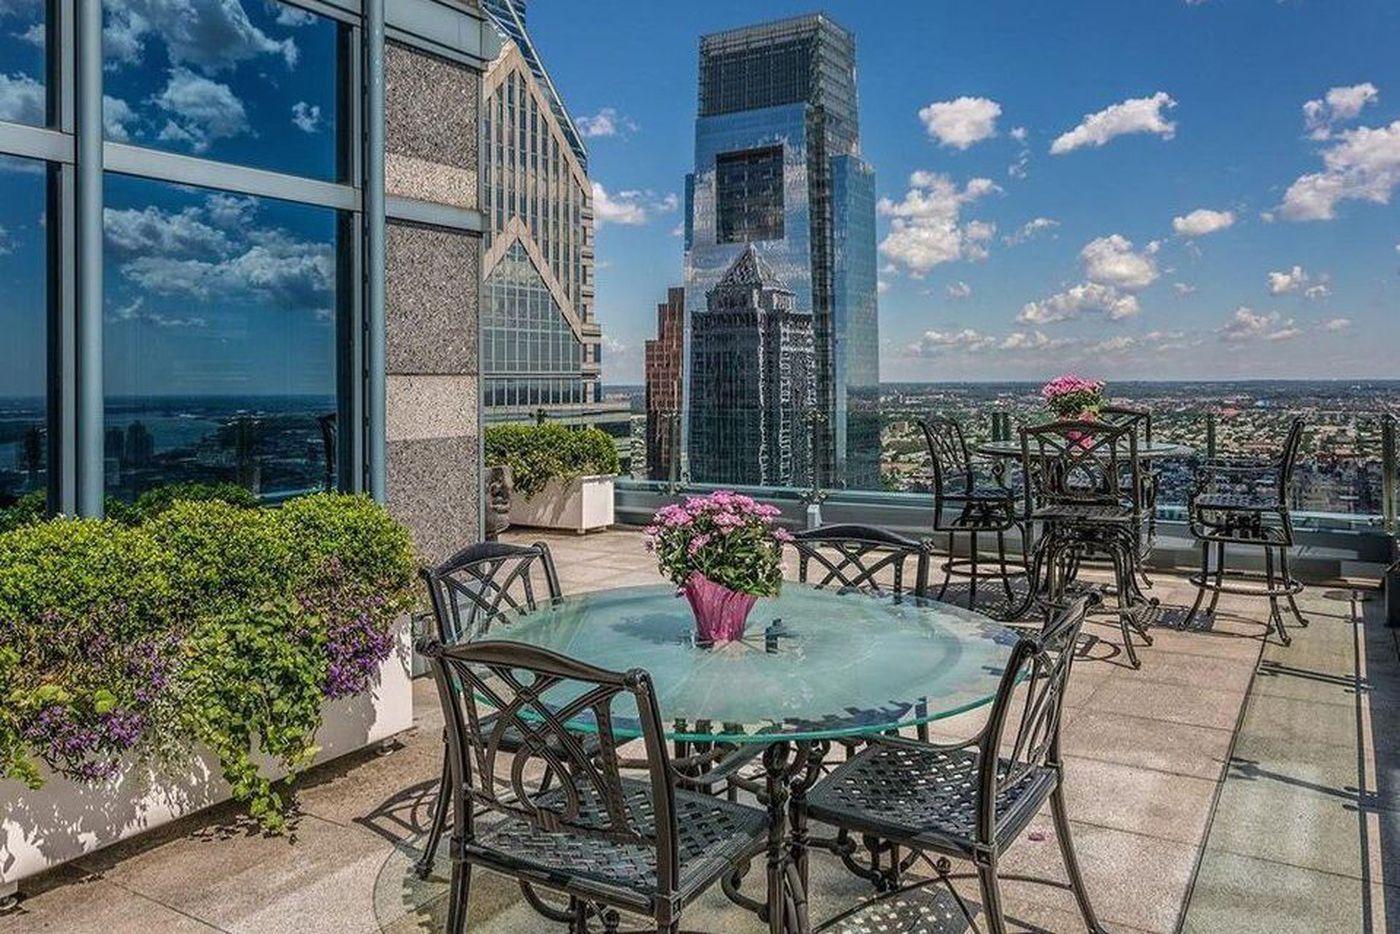 The penthouse view of Philadelphia